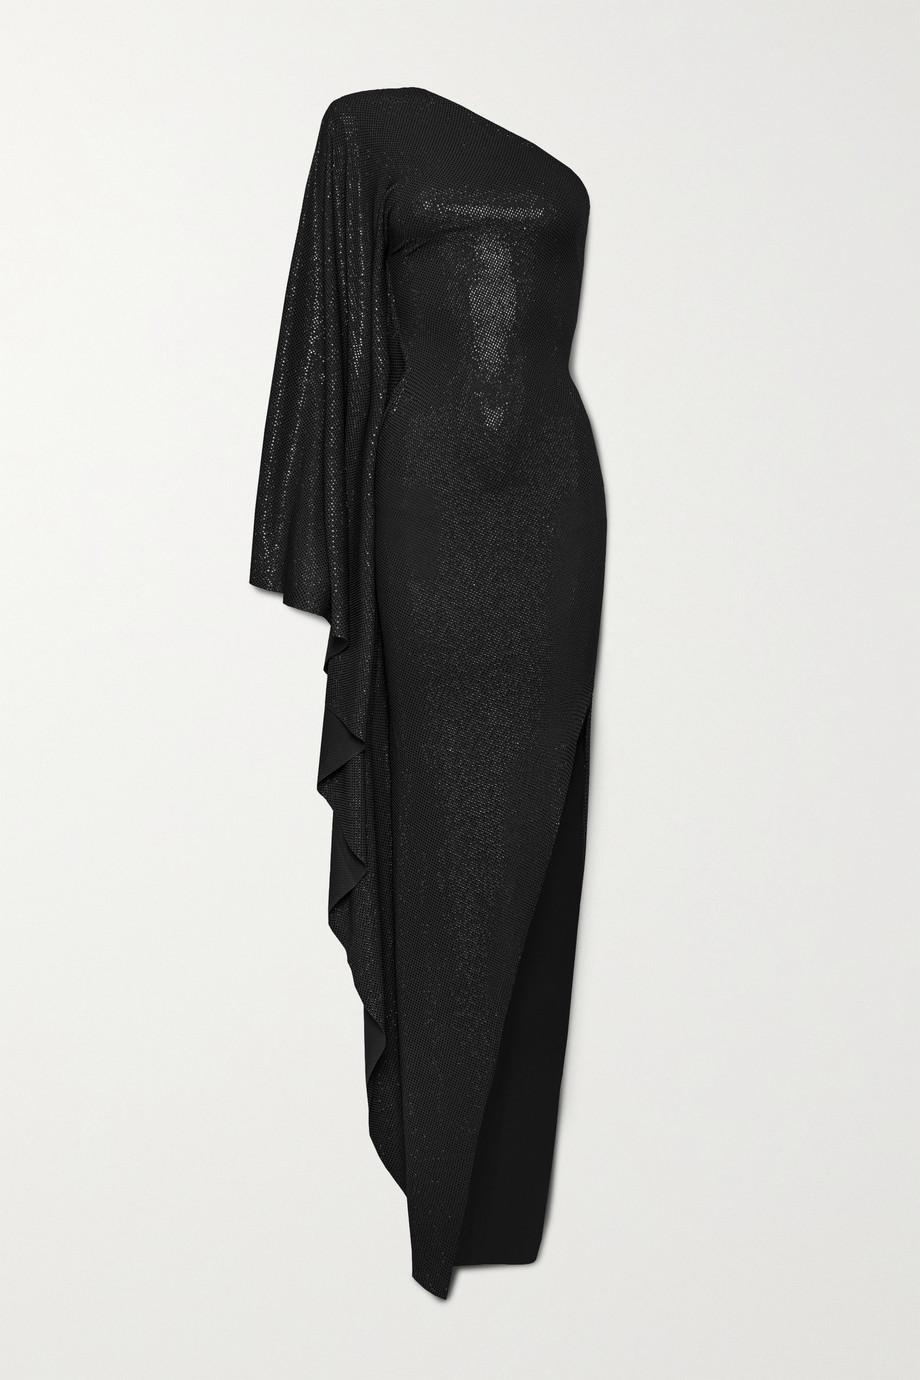 Alexandre Vauthier One-shoulder crystal-embellished stretch-jersey gown